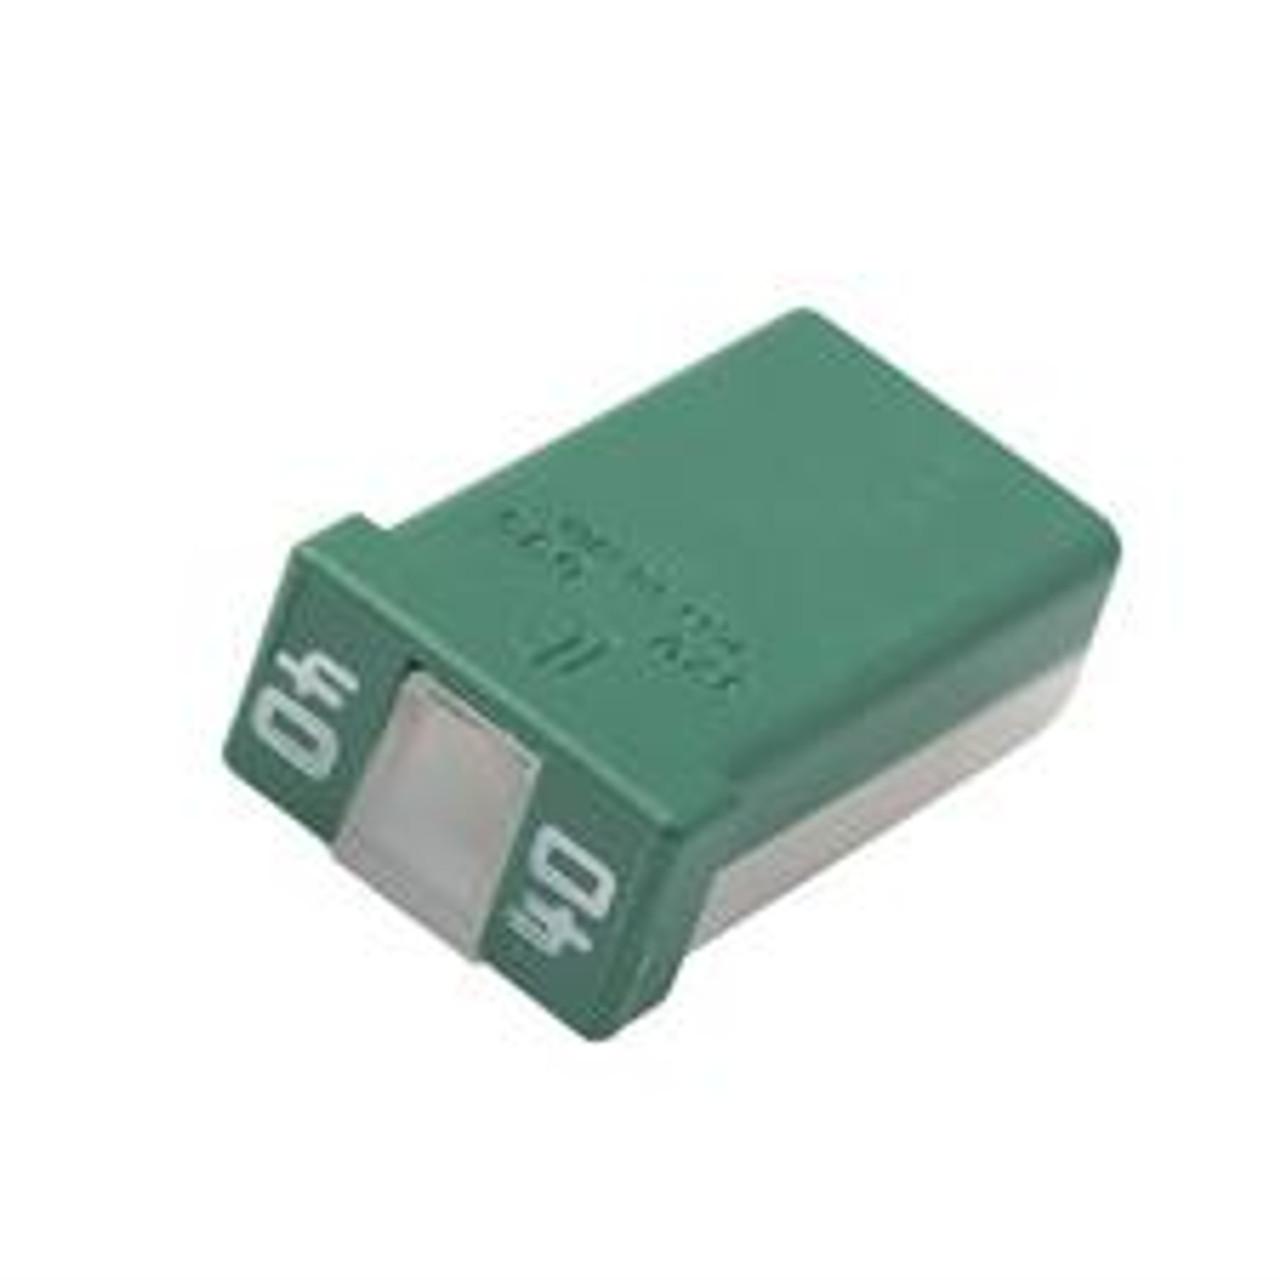 MCASE40 --- 40 Amp MCASE Cartridge Fuse